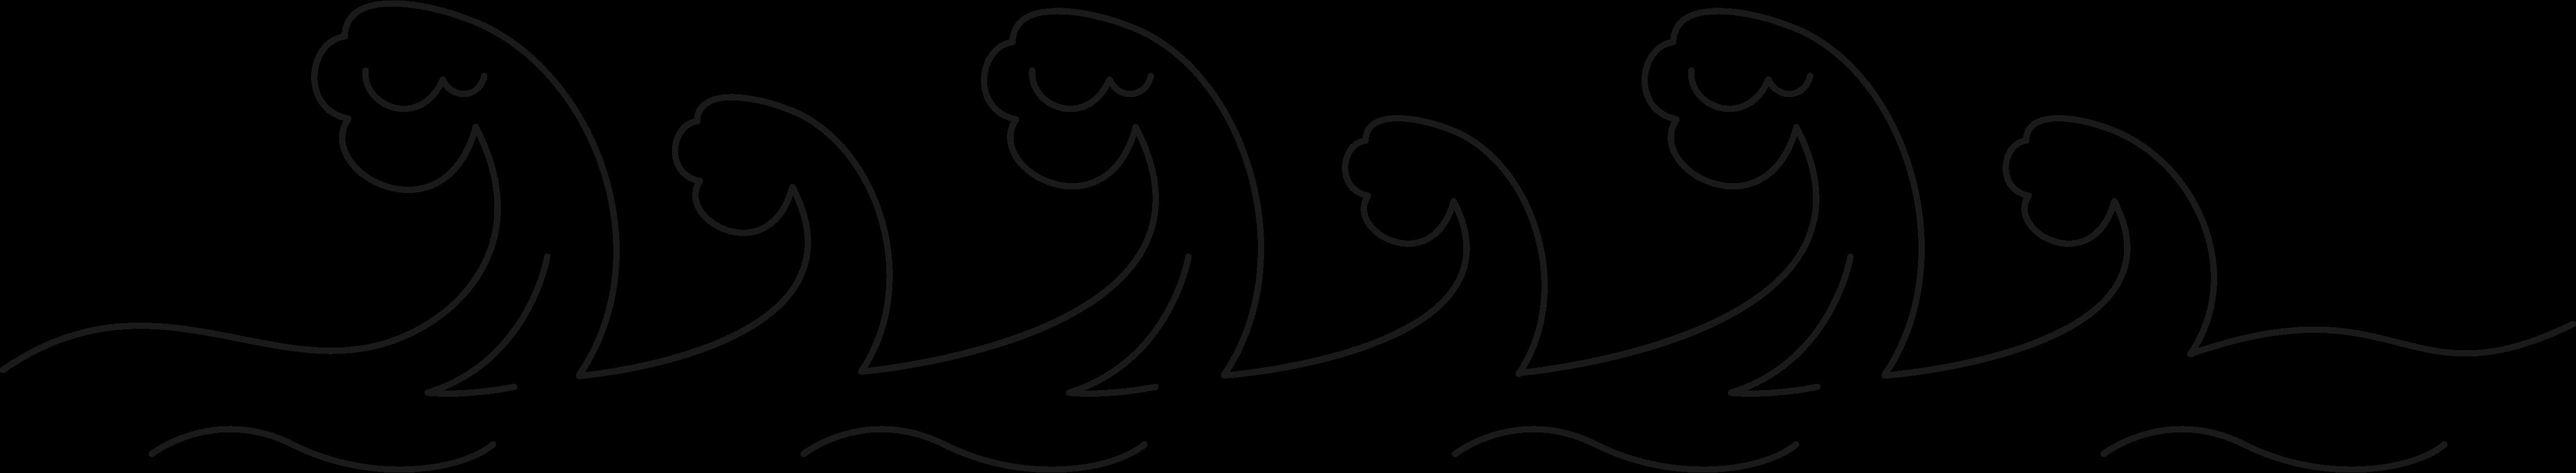 waves pattern Clipart illustration in PNG, SVG